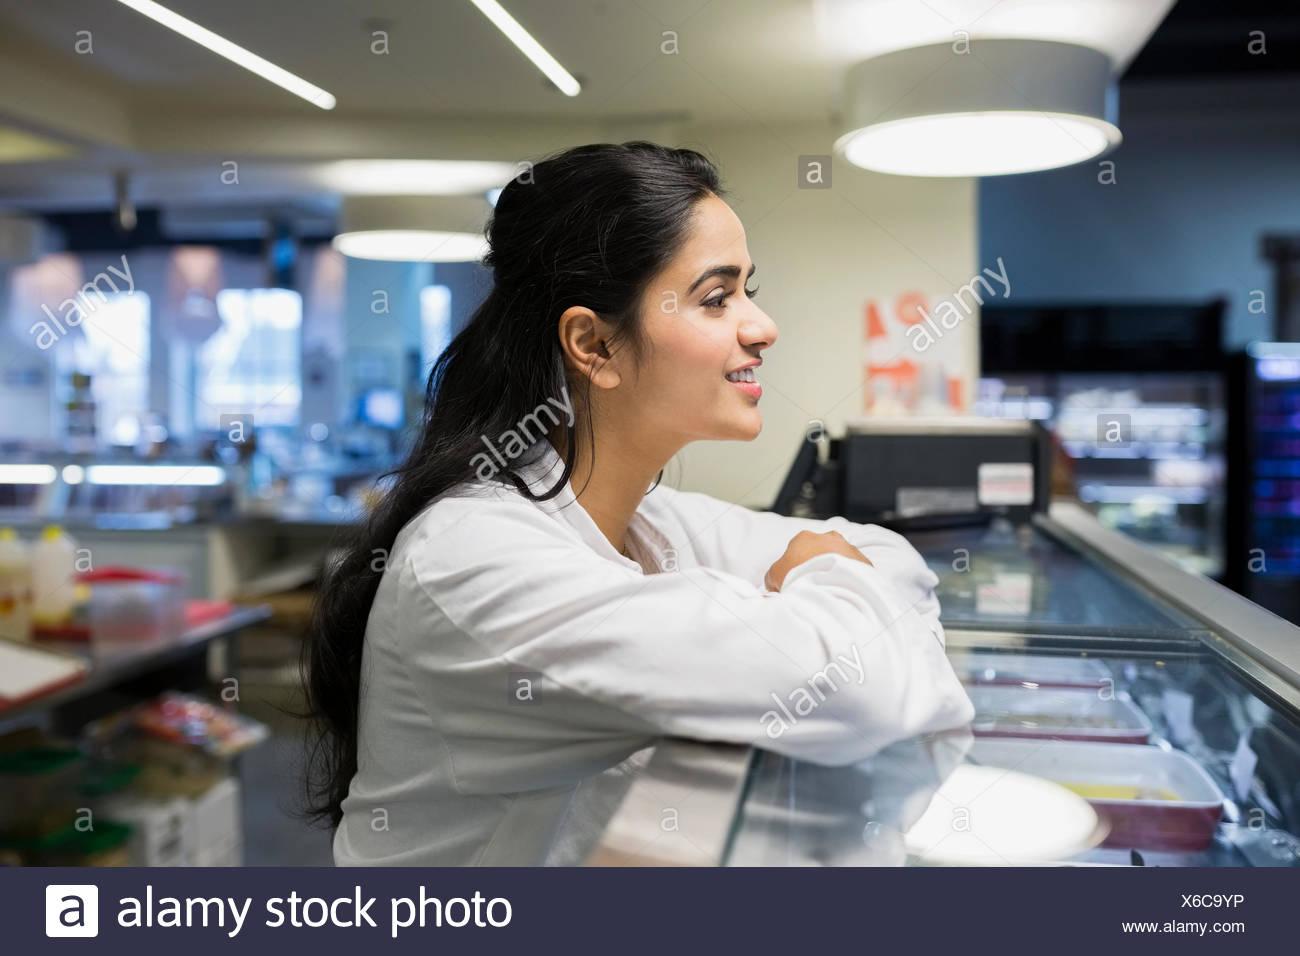 Smiling worker behind deli case - Stock Image